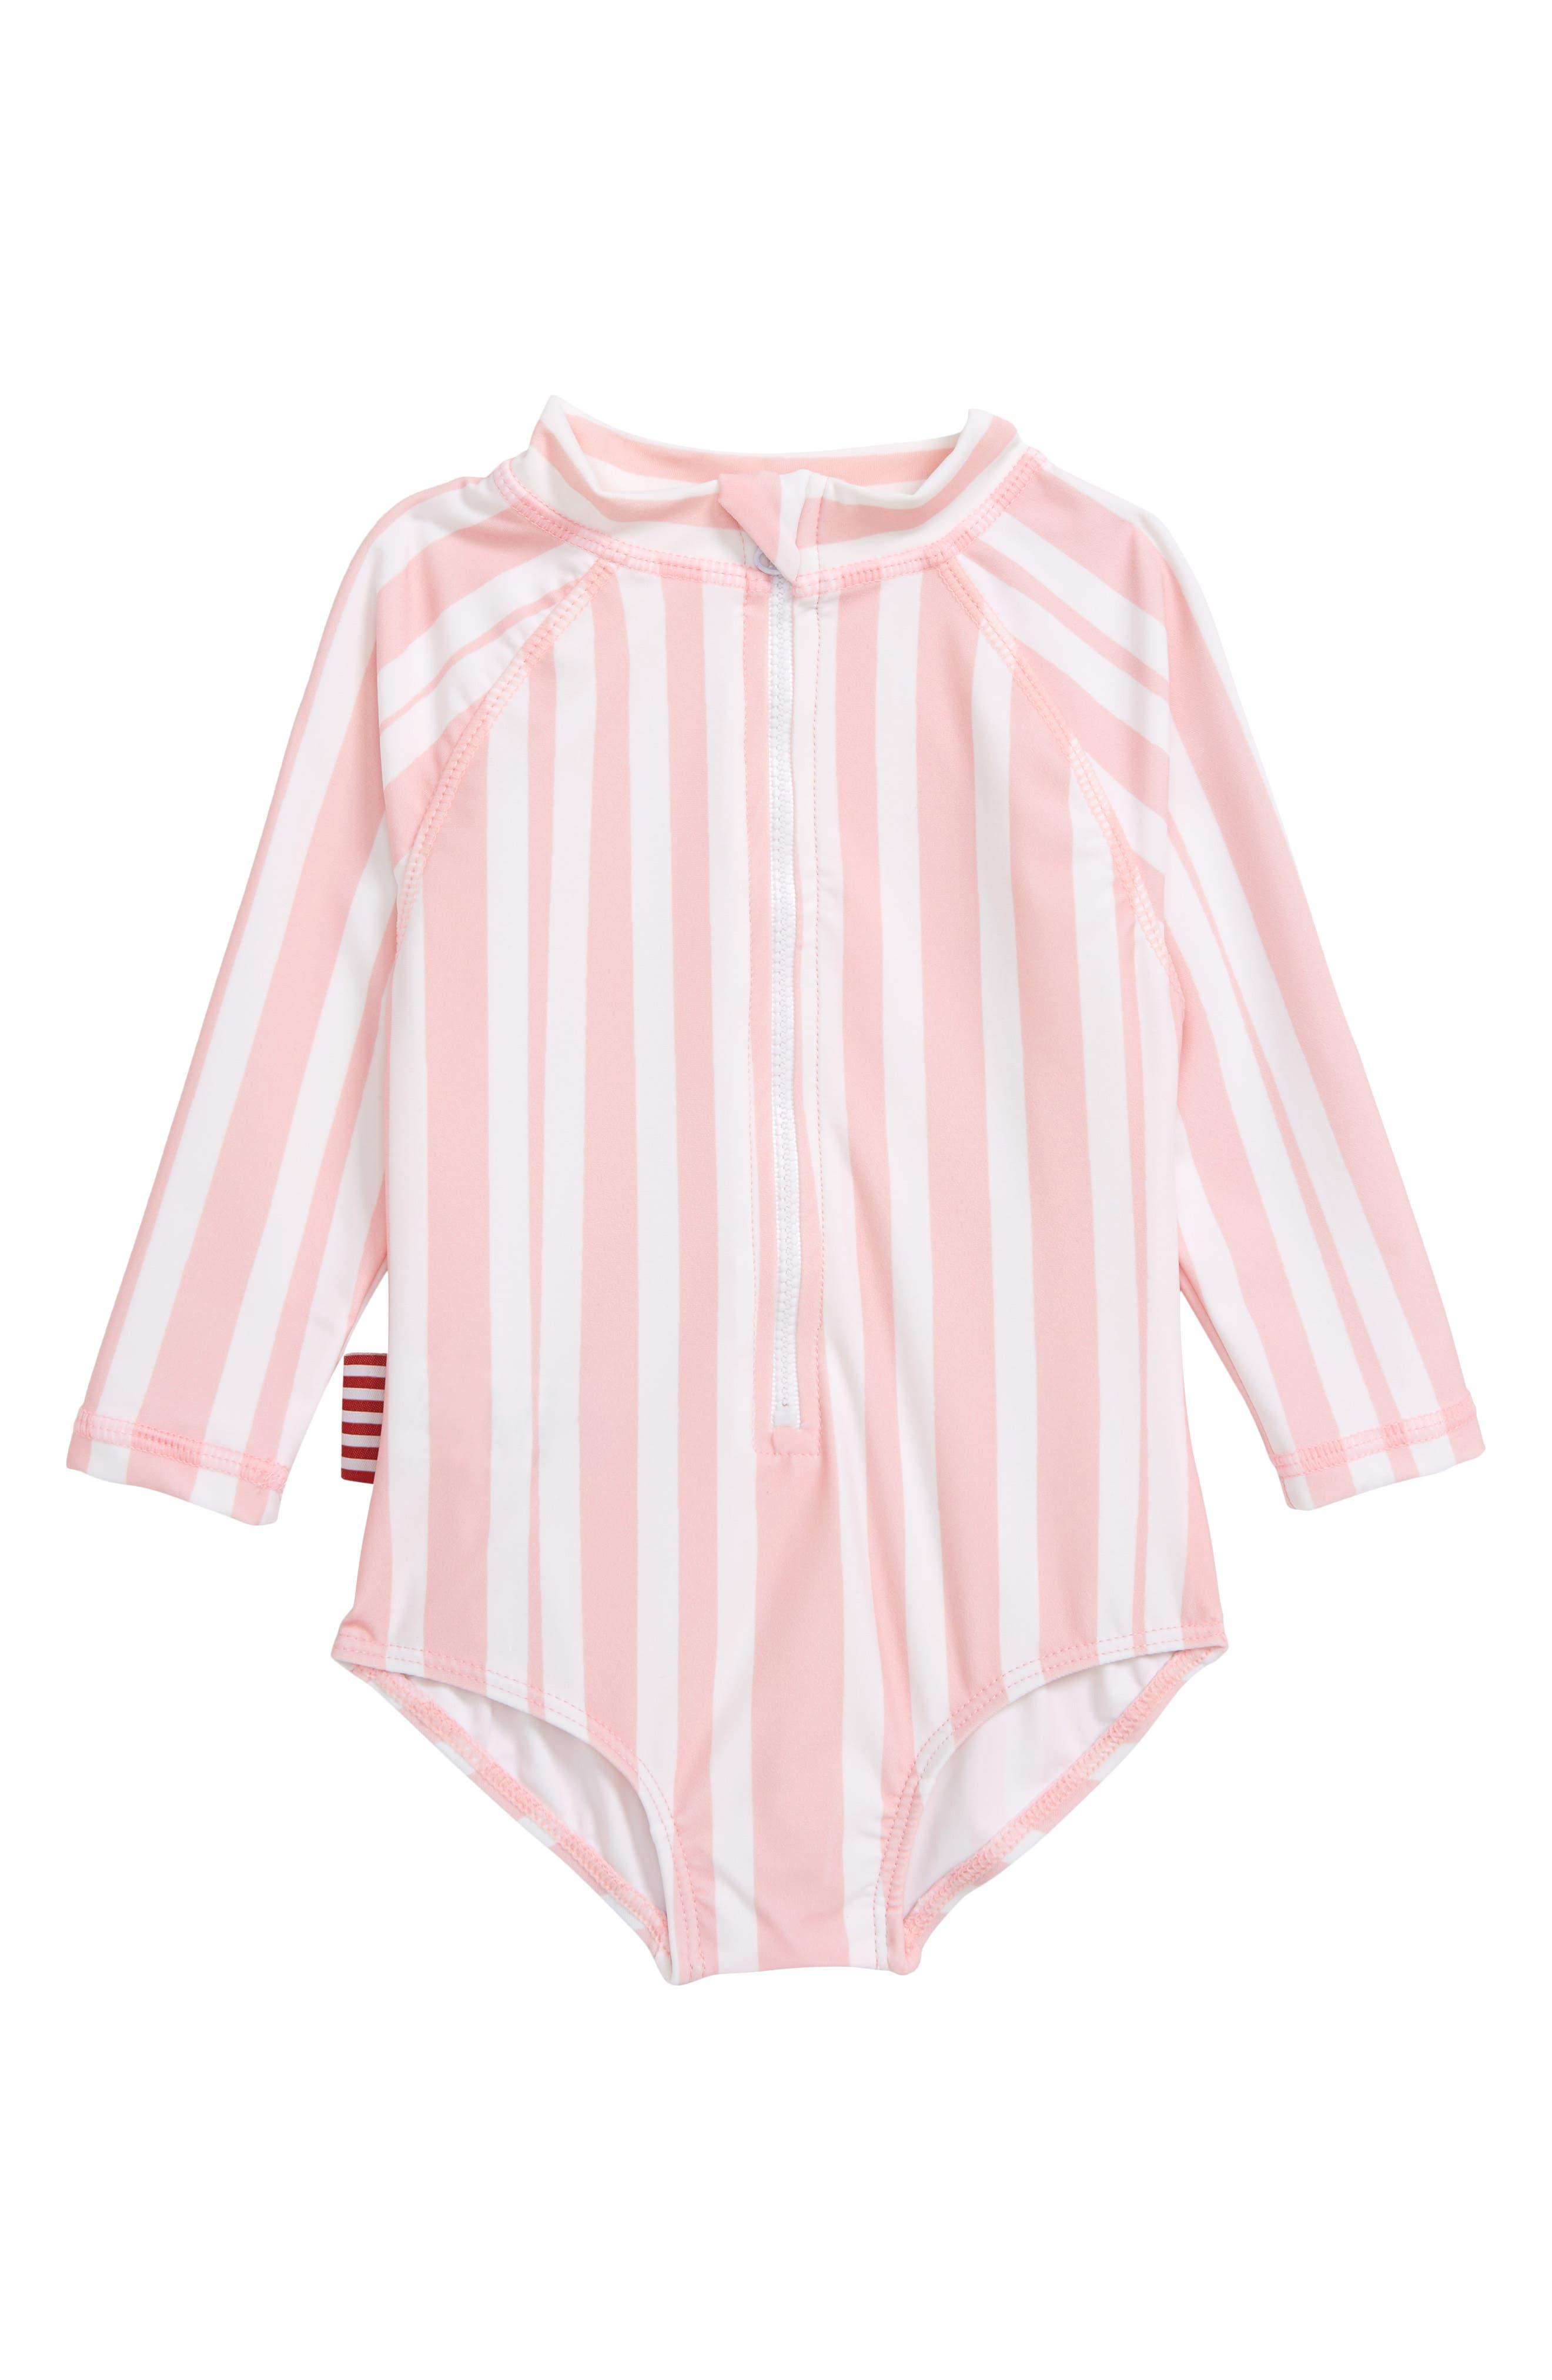 Love You Mucha One-Piece Rashguard Swimsuit,                         Main,                         color, 650